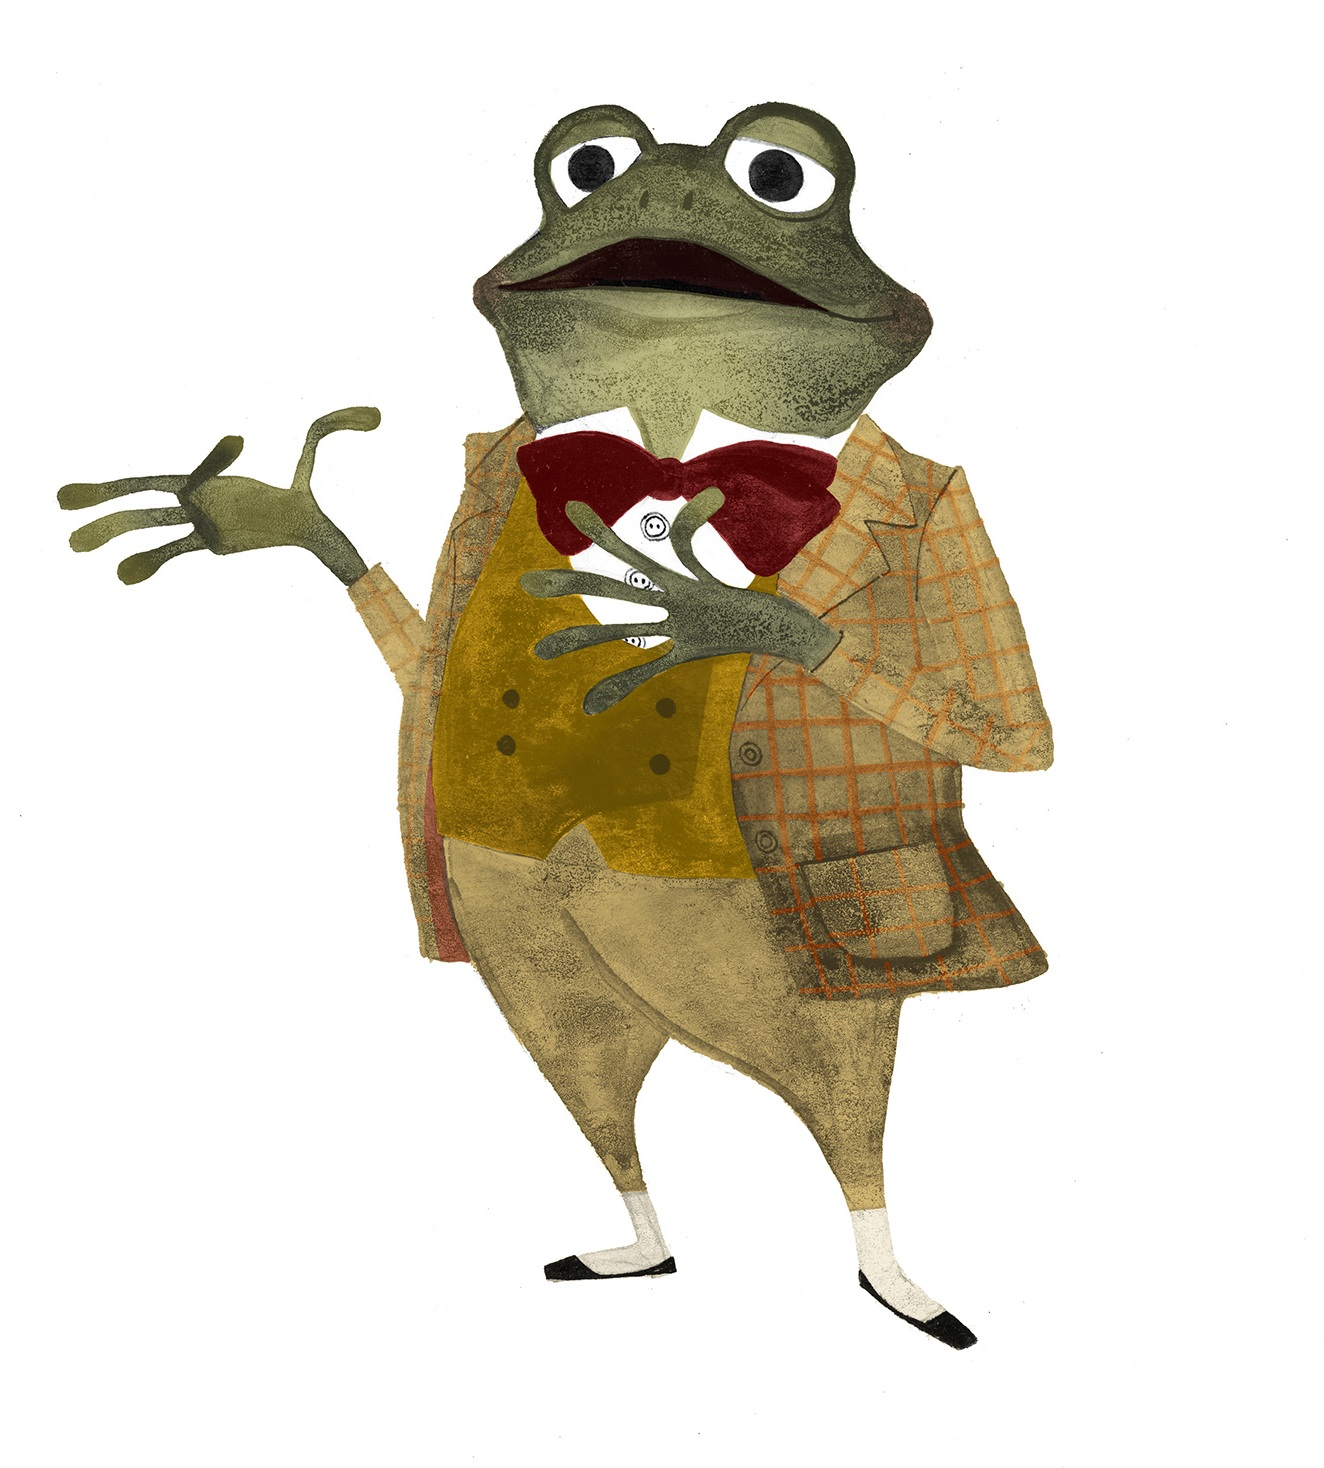 toad_300dpi.jpg